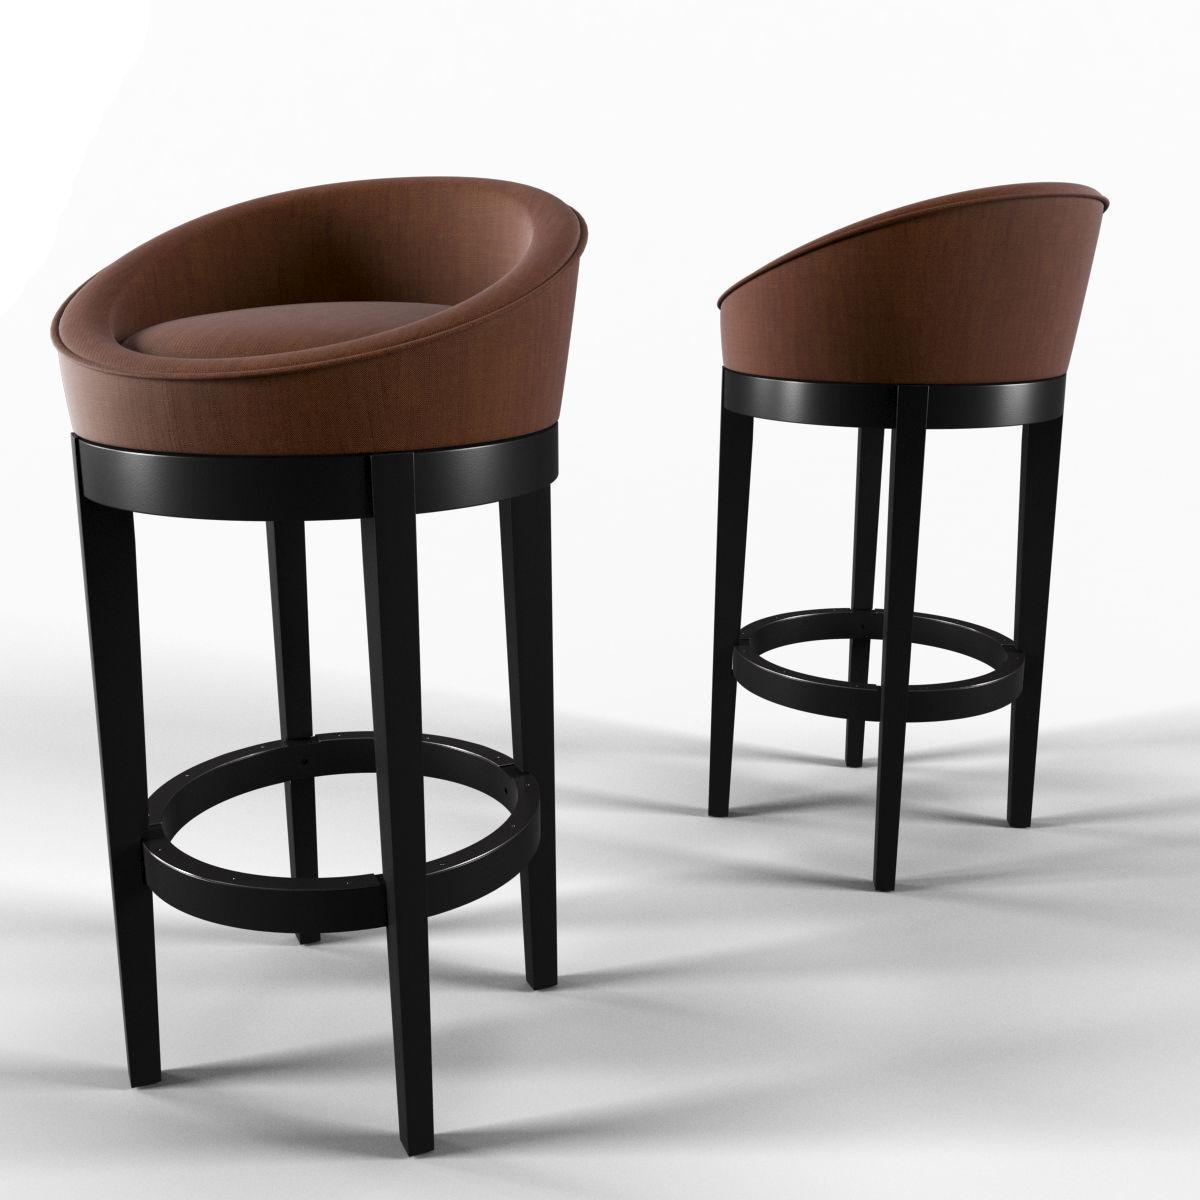 Fantastic Chair No 7 Uris Swivel Microfiber Bar Stool 3D Model Dailytribune Chair Design For Home Dailytribuneorg